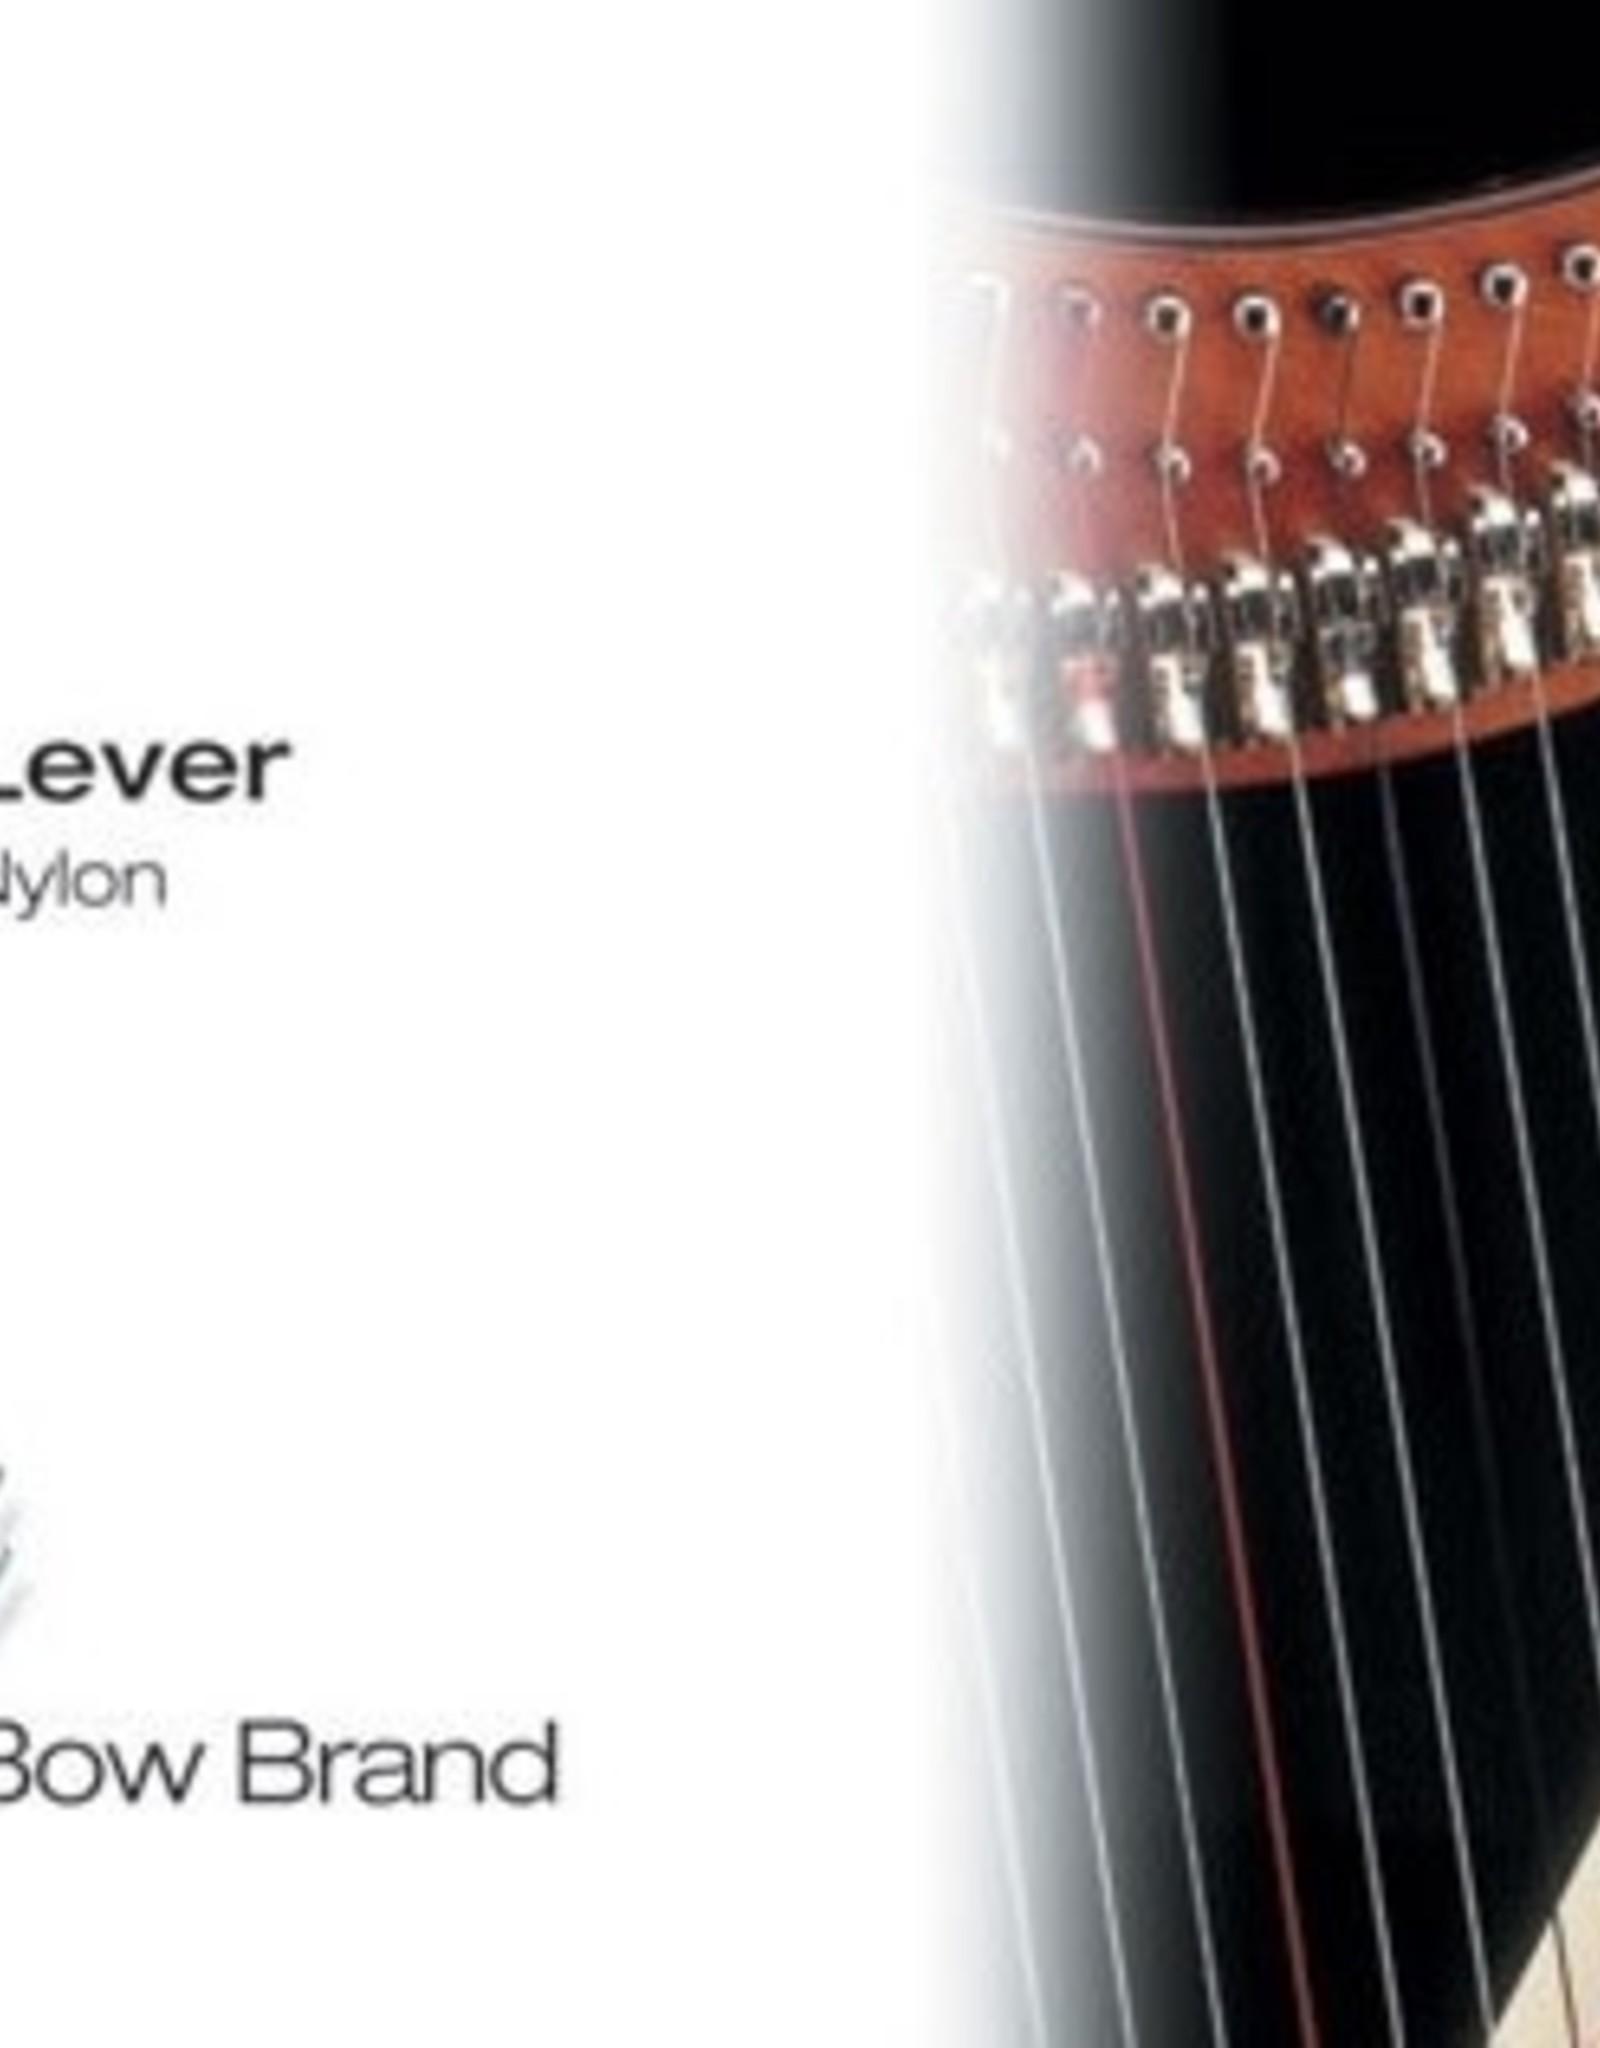 BOW BRAND  klep nylon - lever NYLON 19/3 la